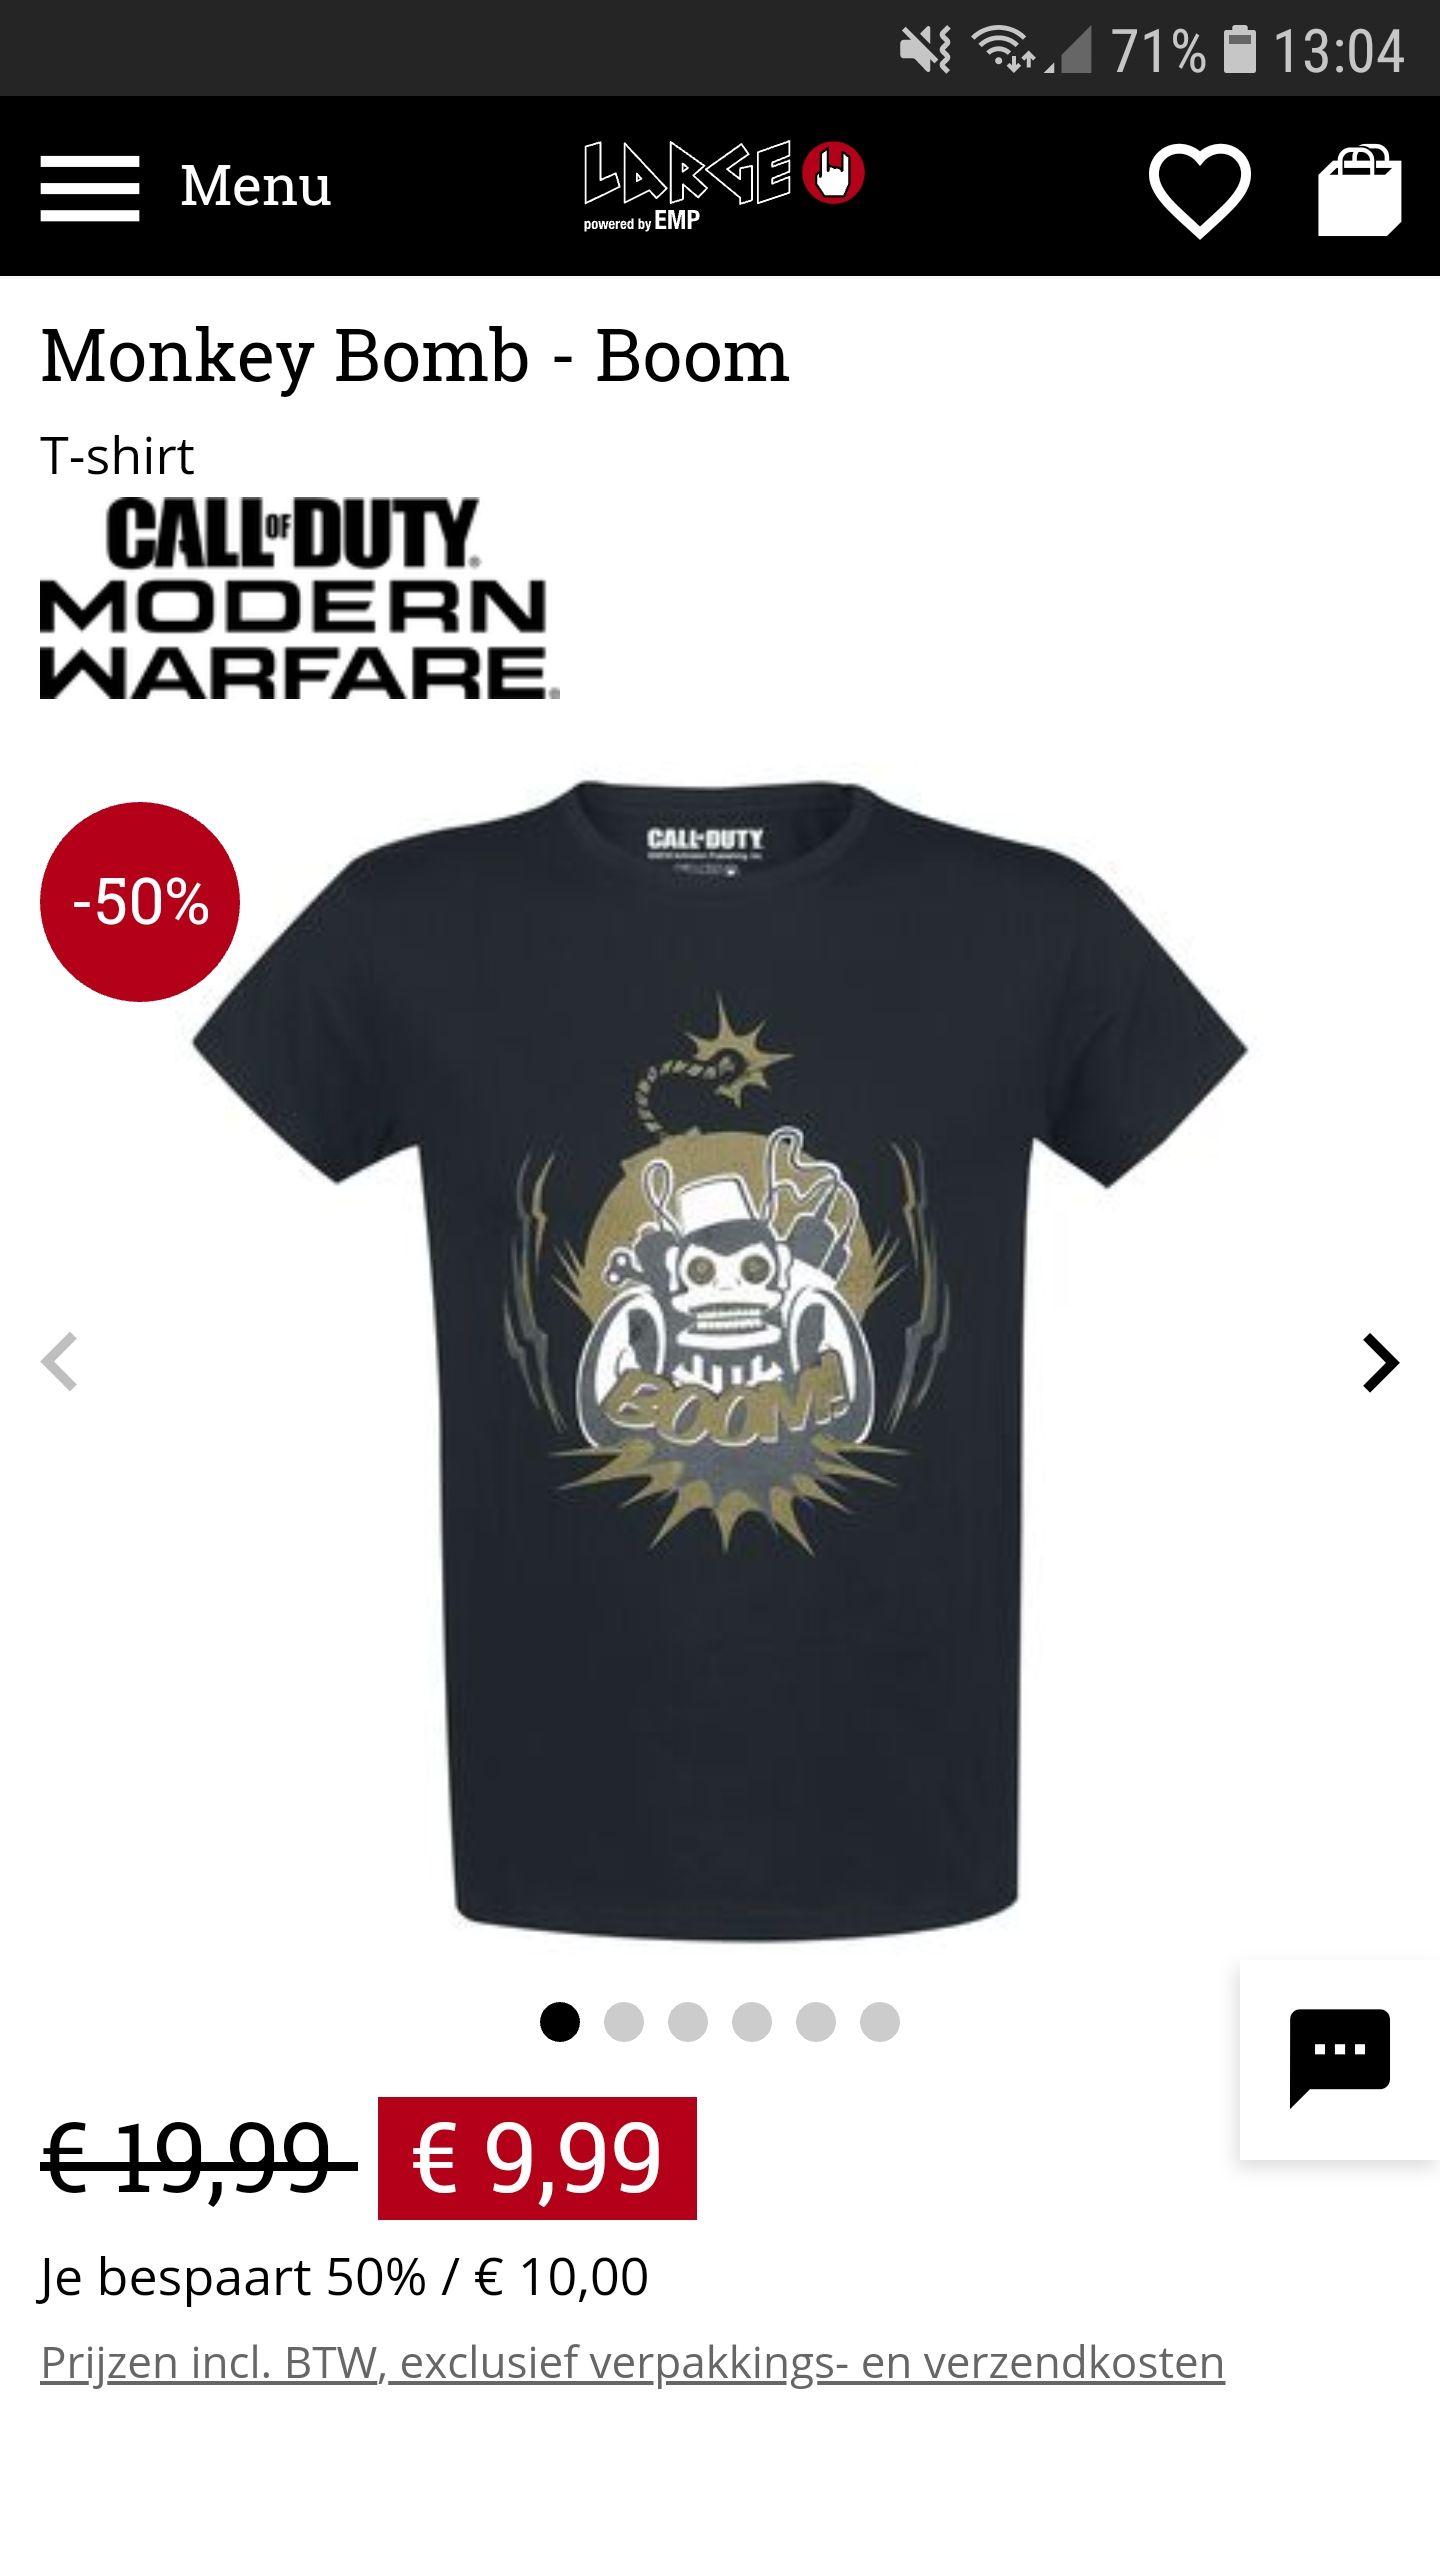 Cod Monkey Boom T-shirt